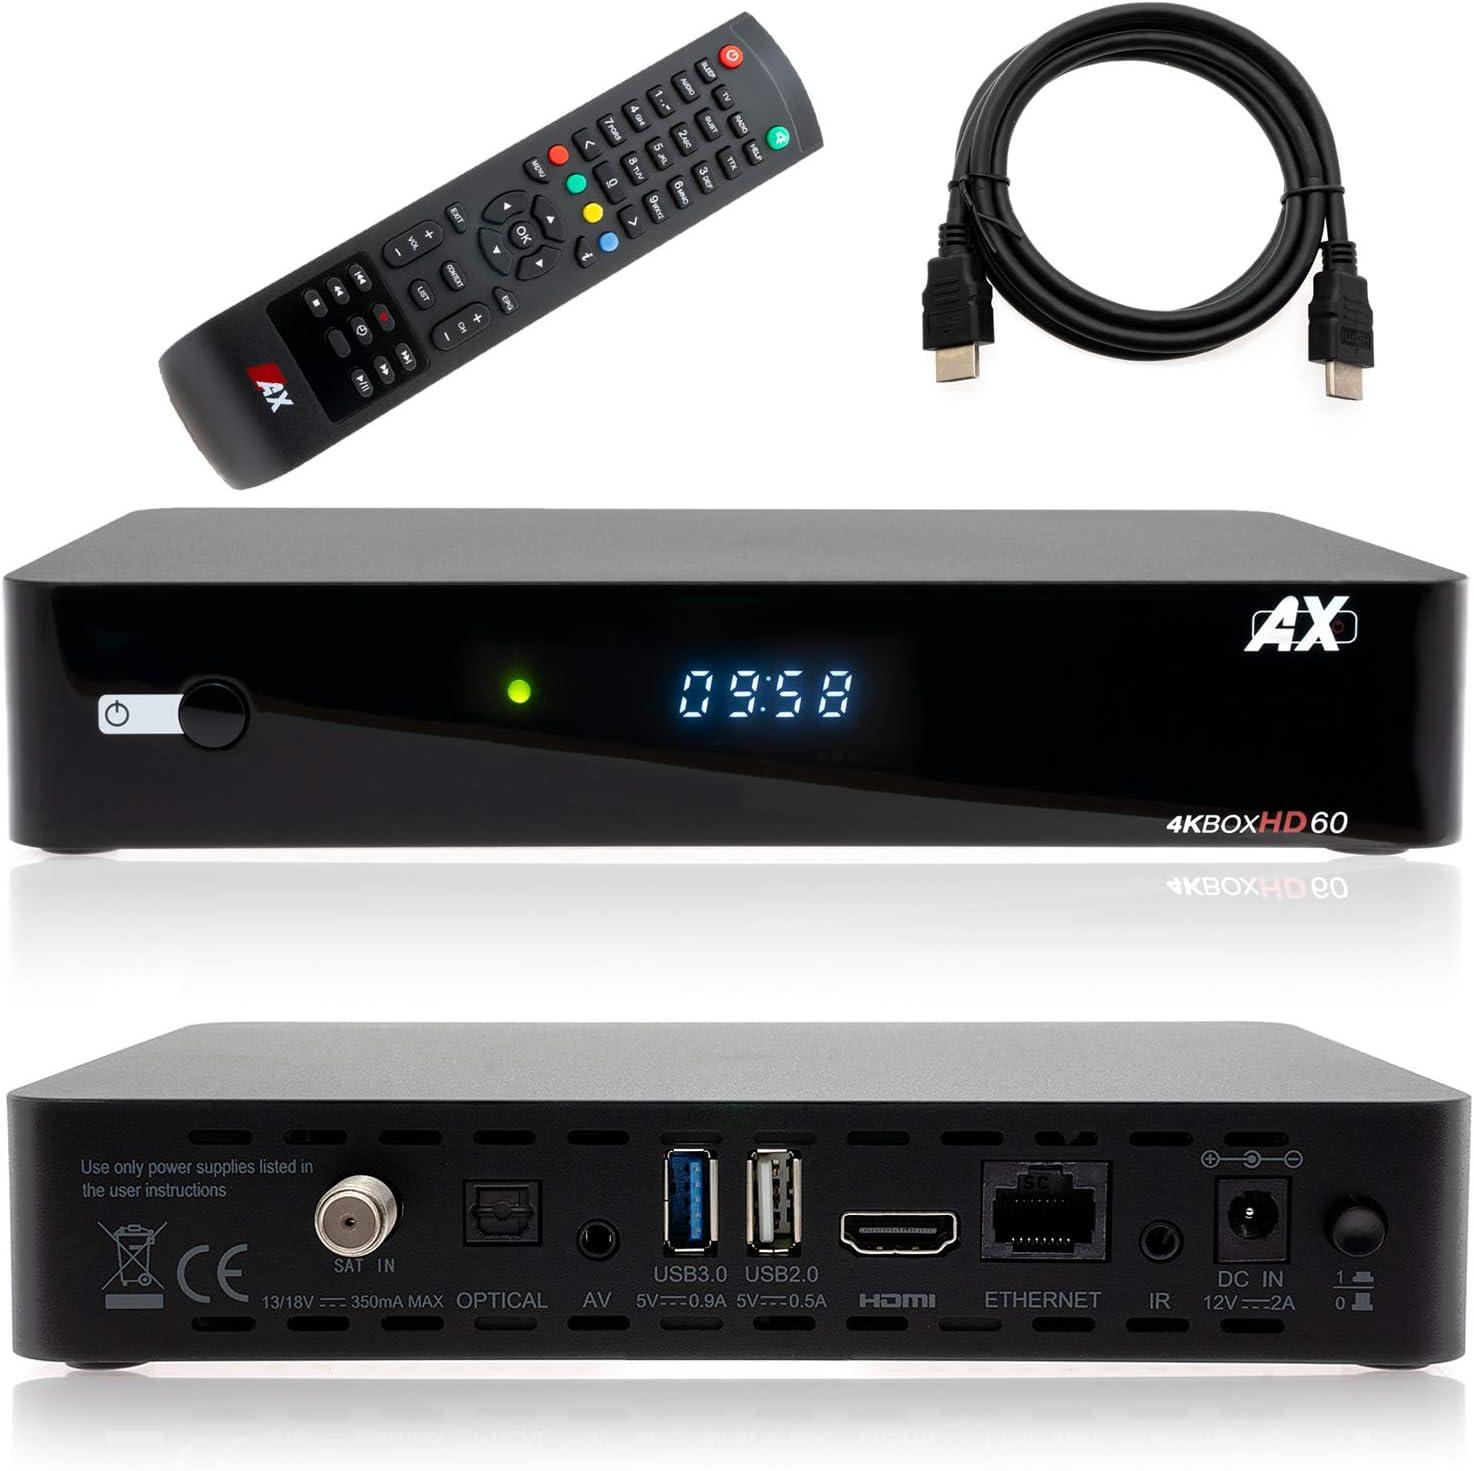 Ax Hd60 4k Uhd 2160p E2 Linux 1x Dvb S2x Satellite Elektronik